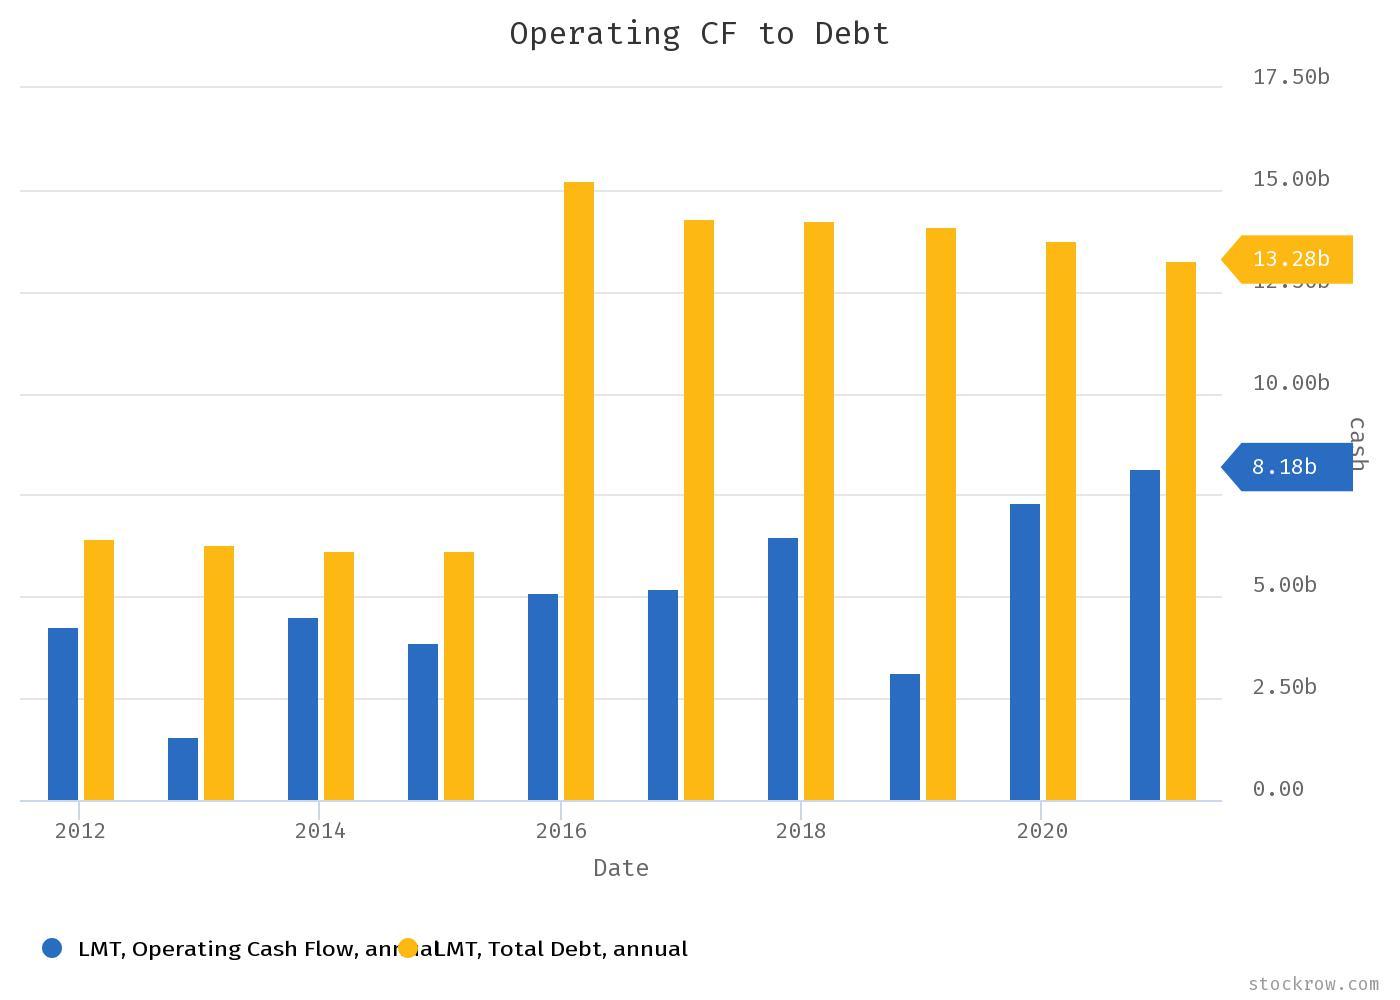 Lockheed Martin Stock Analysis, Operating Cash Flow to Debt